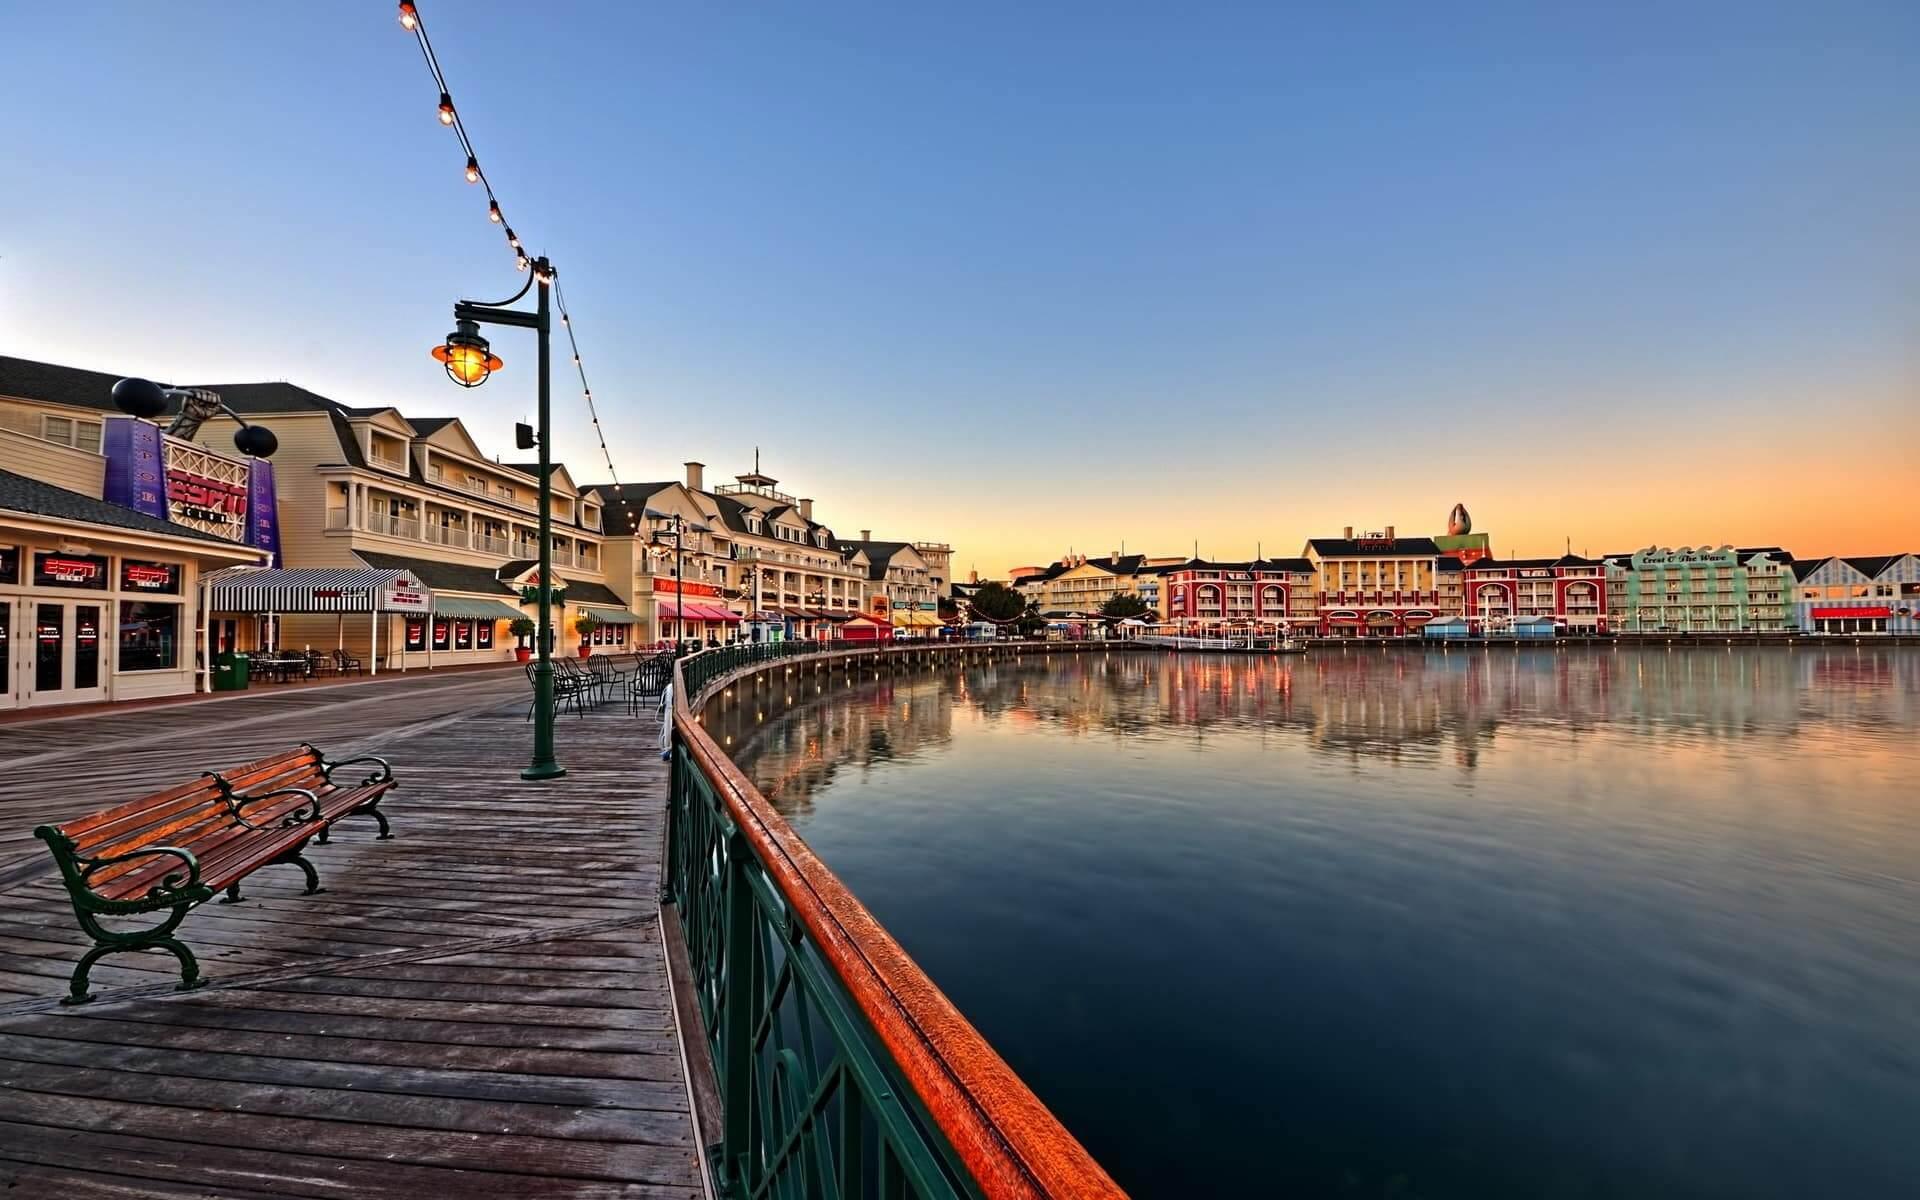 Disney's Boardwalk em Orlando 3